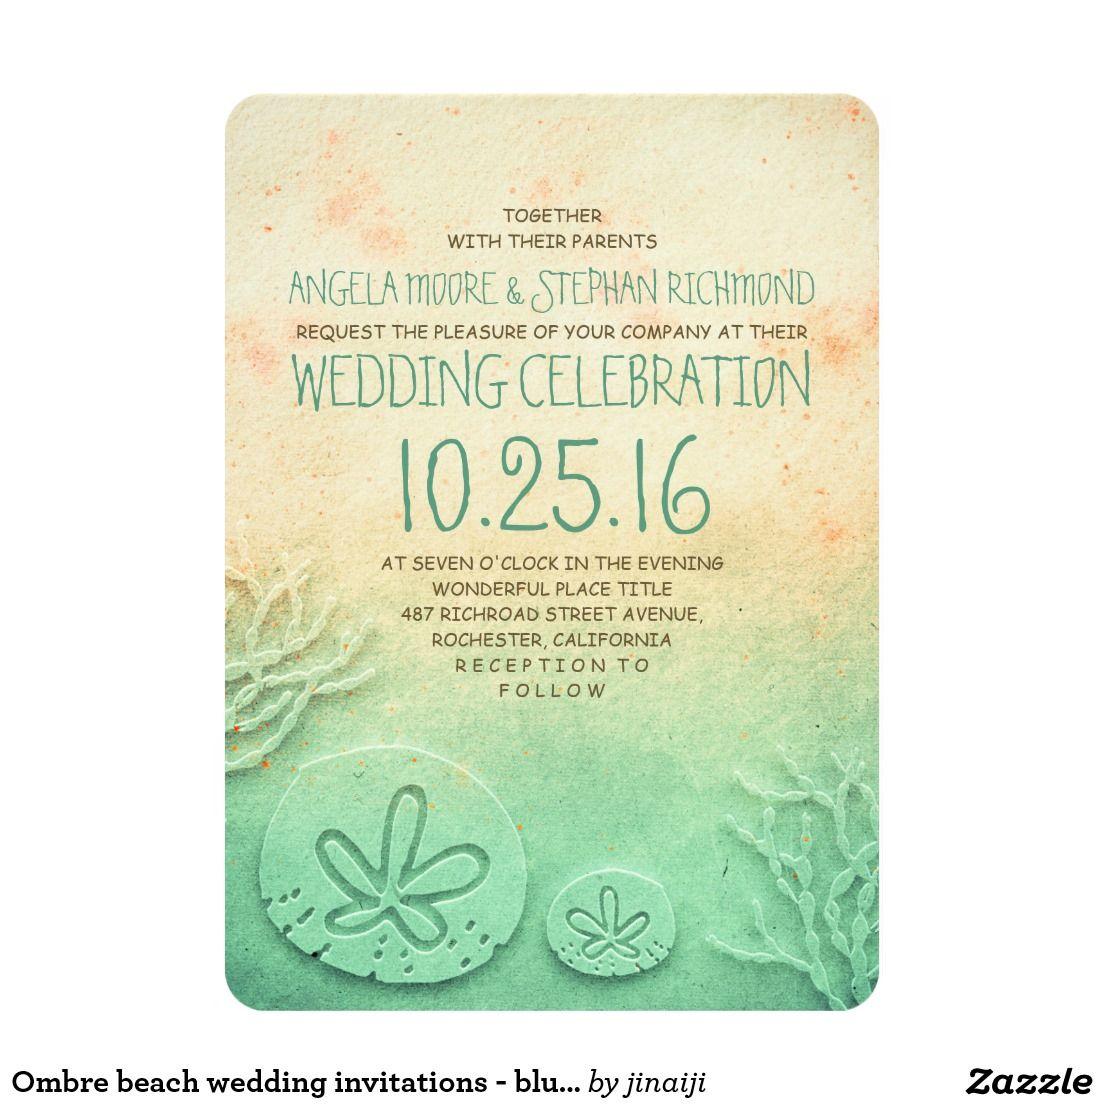 Ombre beach wedding invitations - blush teal color | Beach Wedding ...